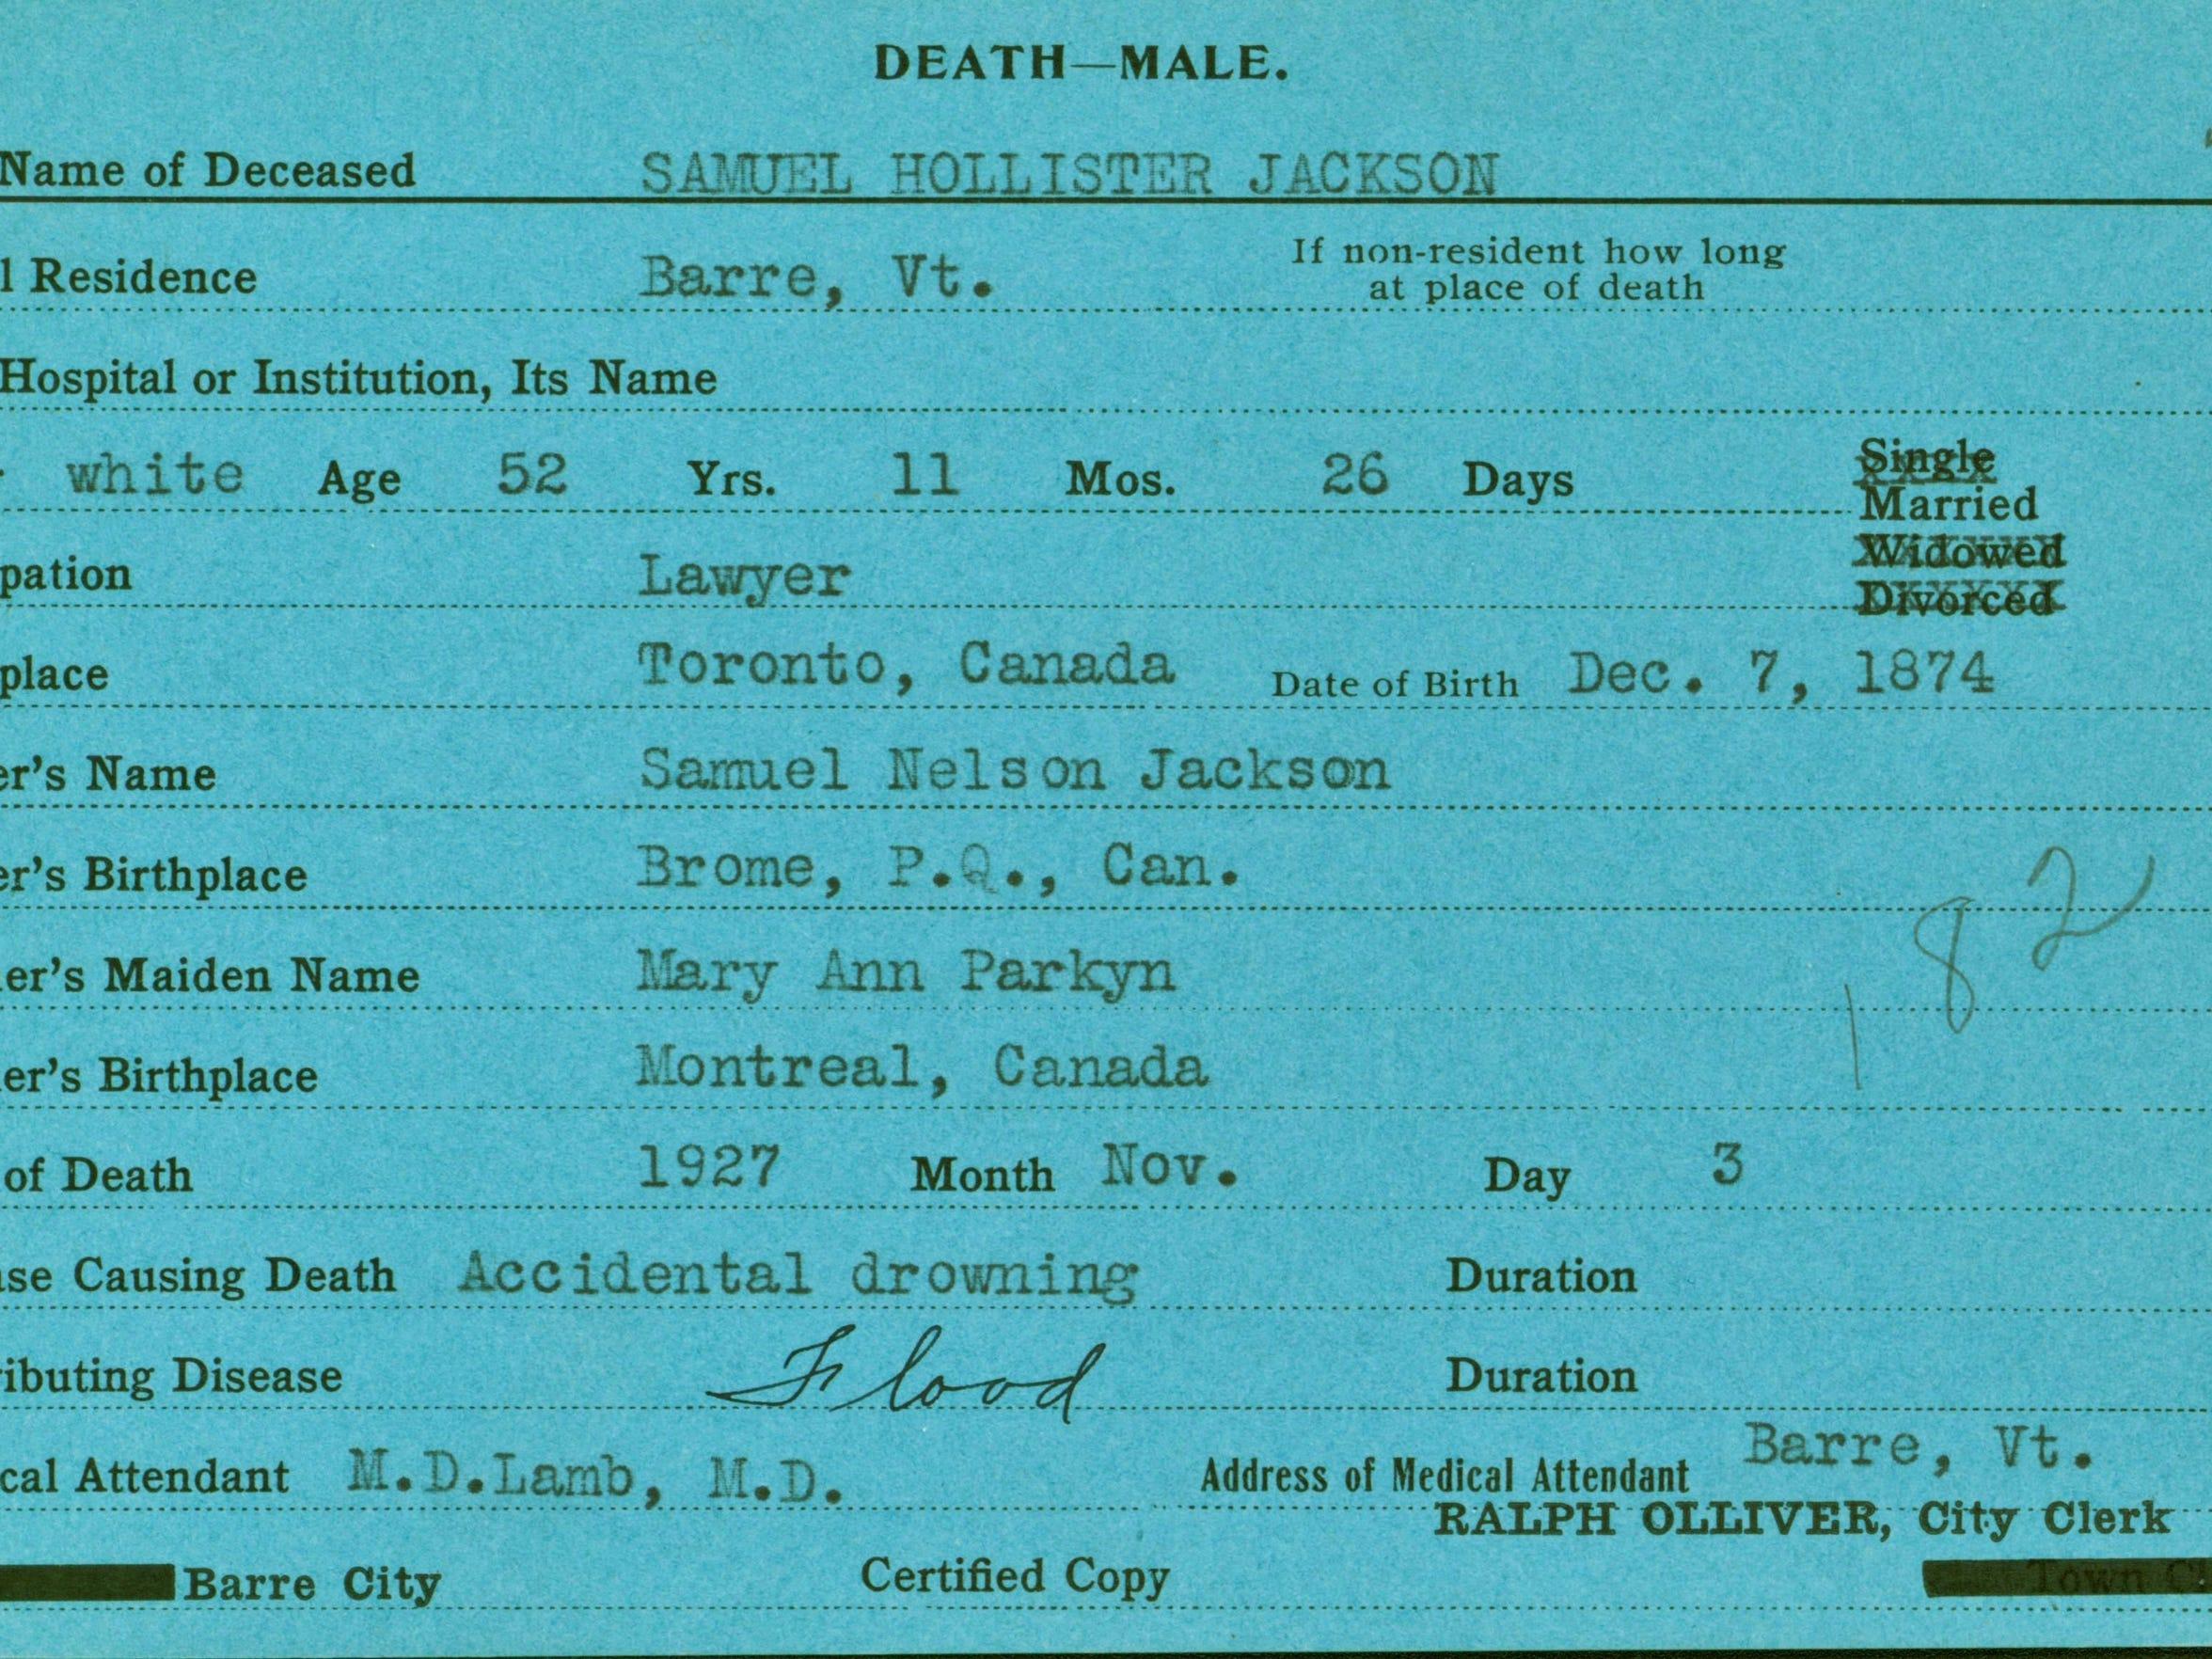 SHollisterJackson_Death1927_PR-00762